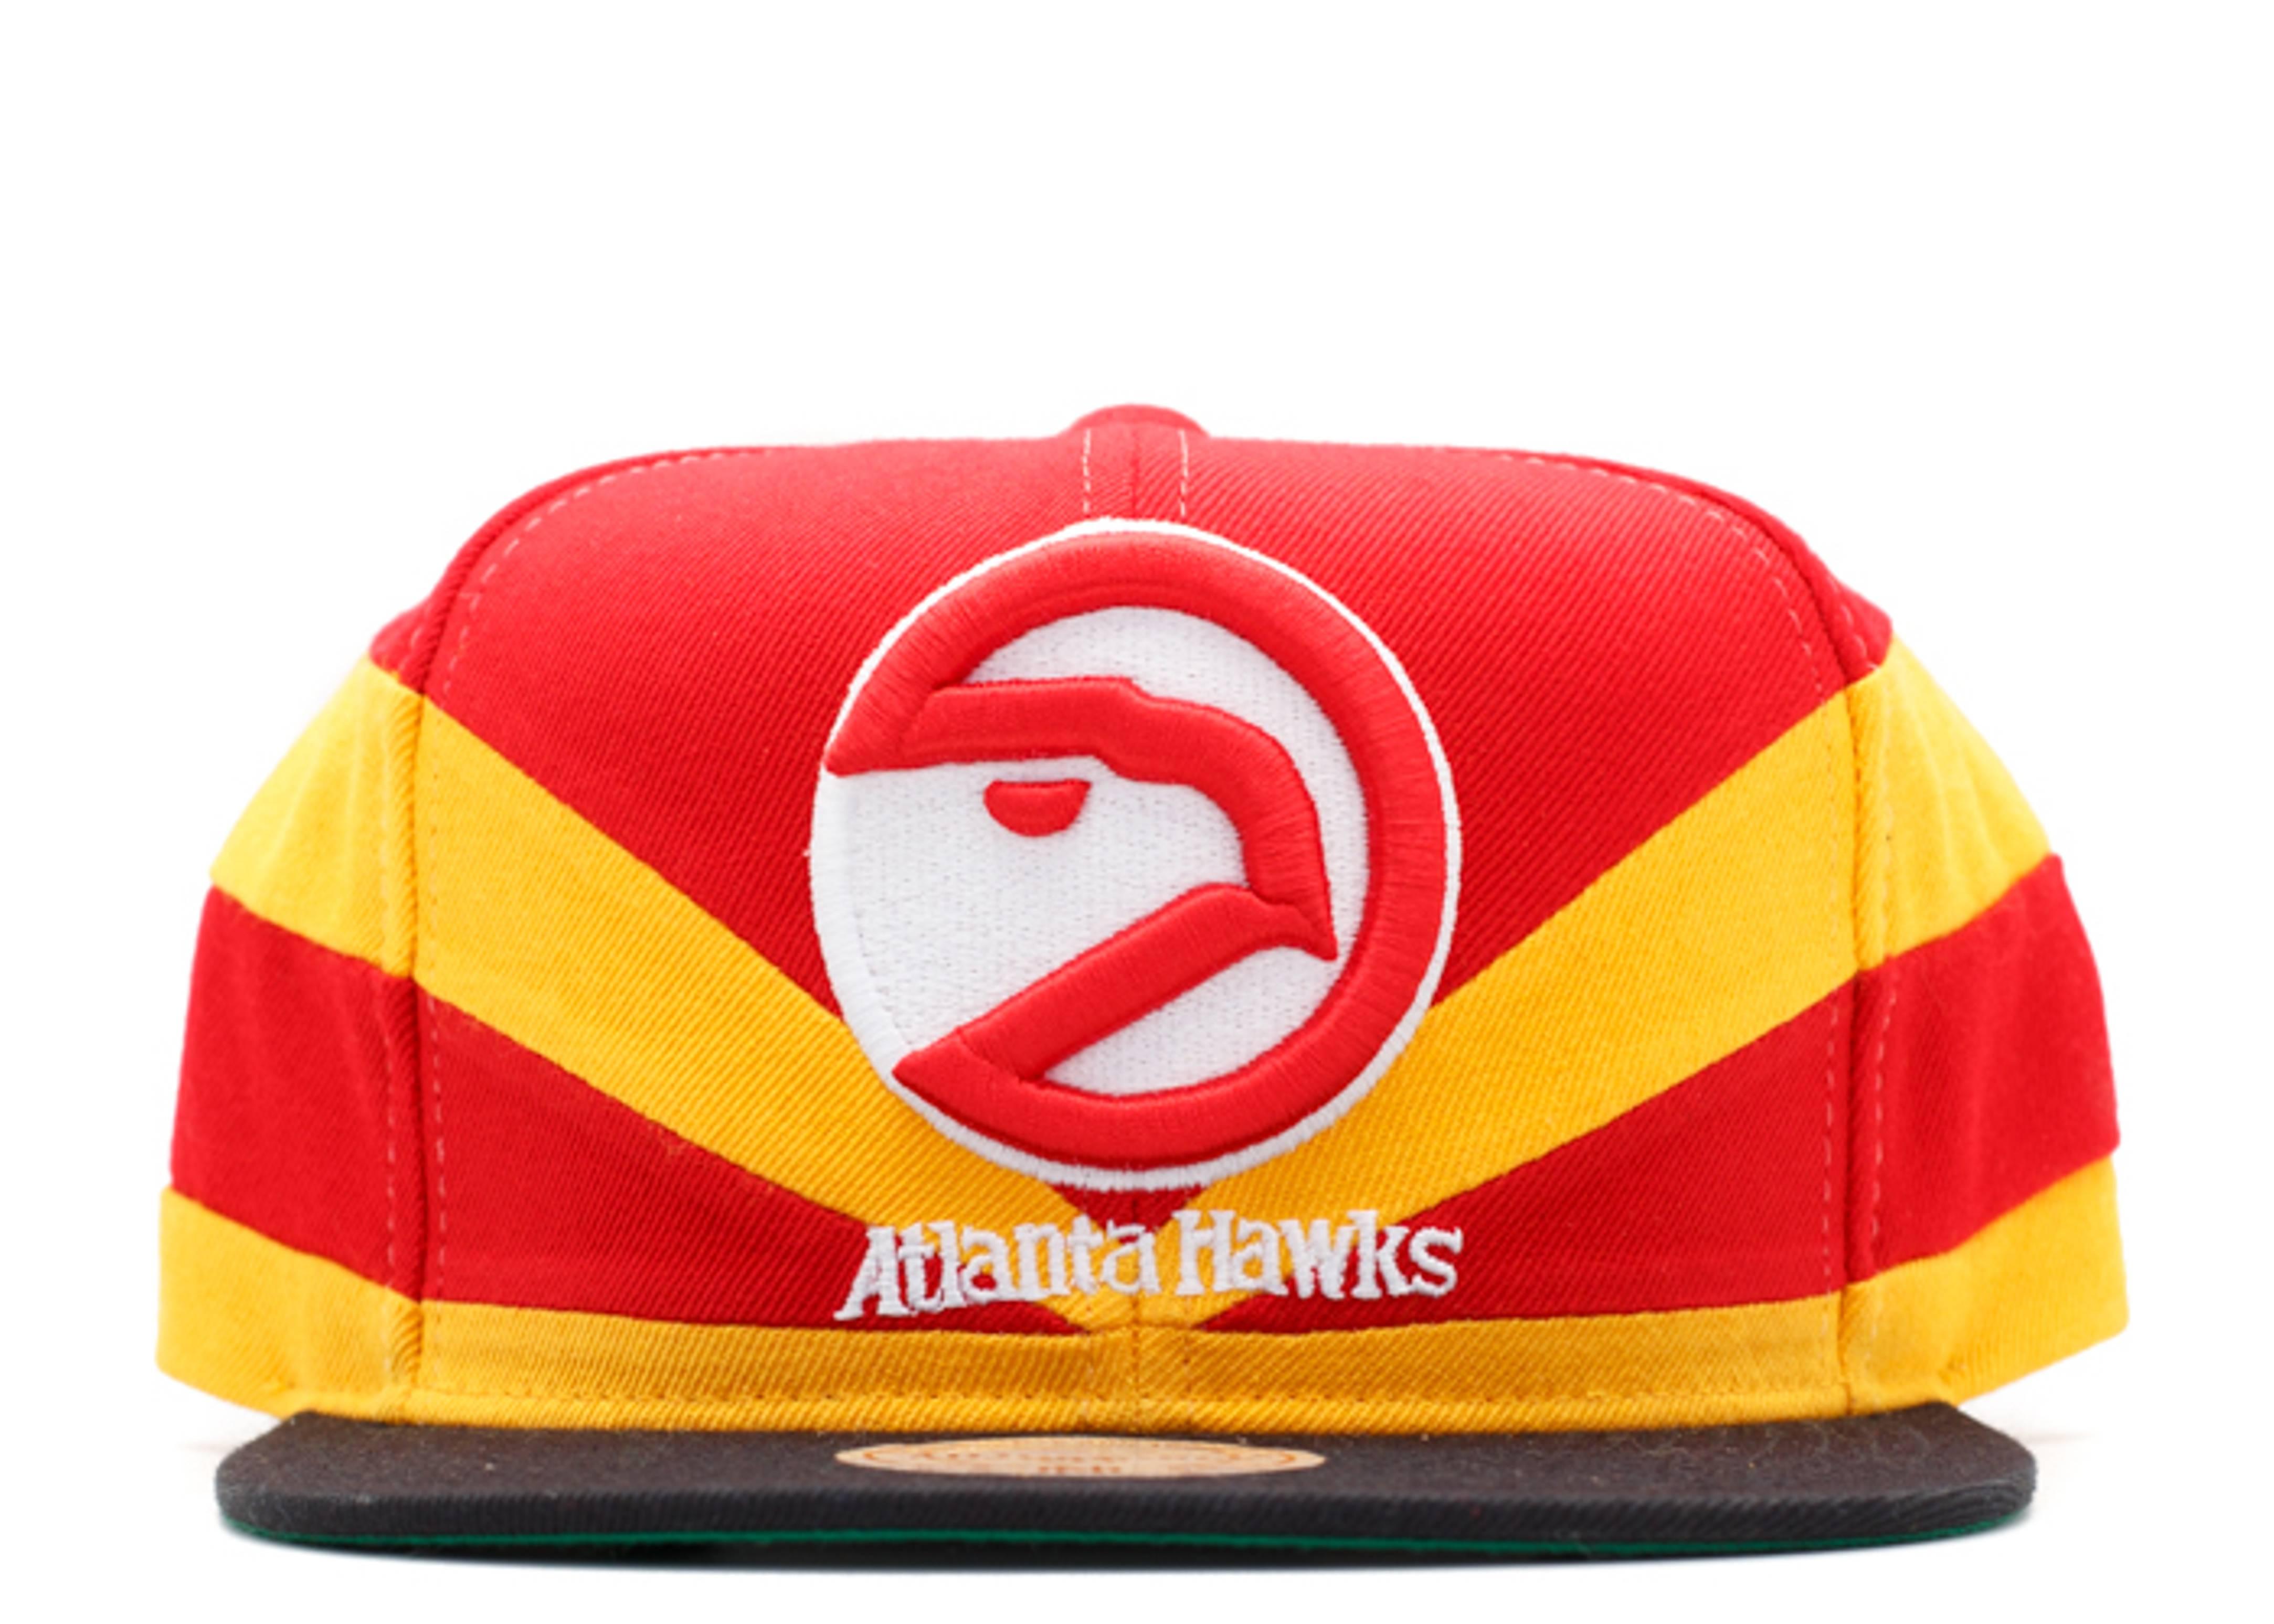 alanta hawks snap-back